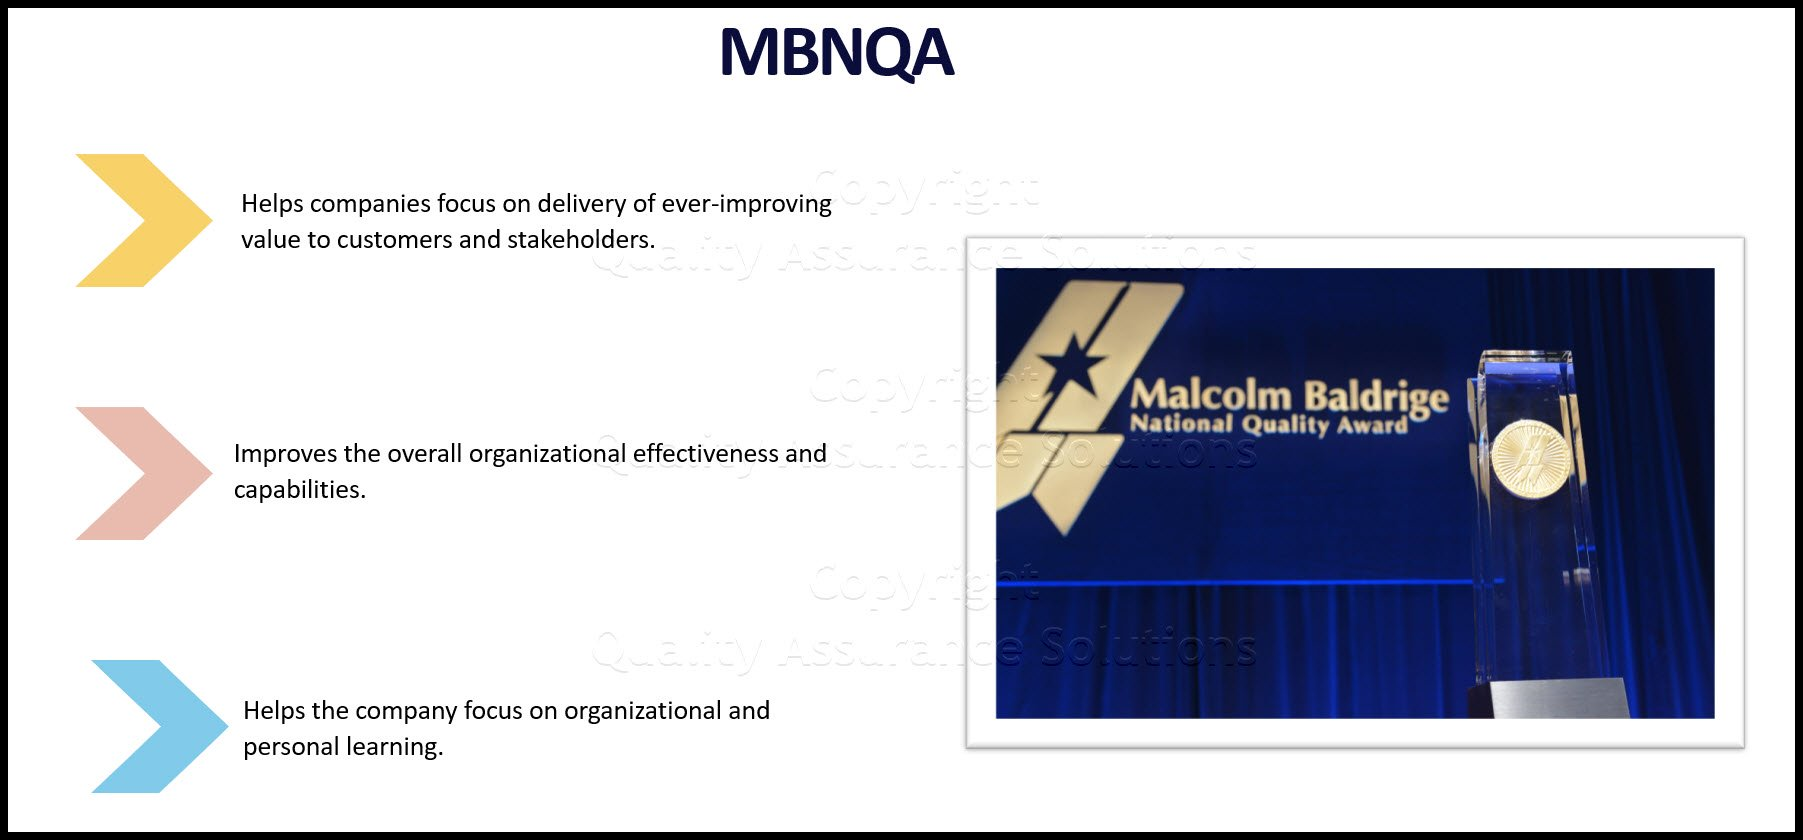 Malcolm Baldrige National Quality Award business slide